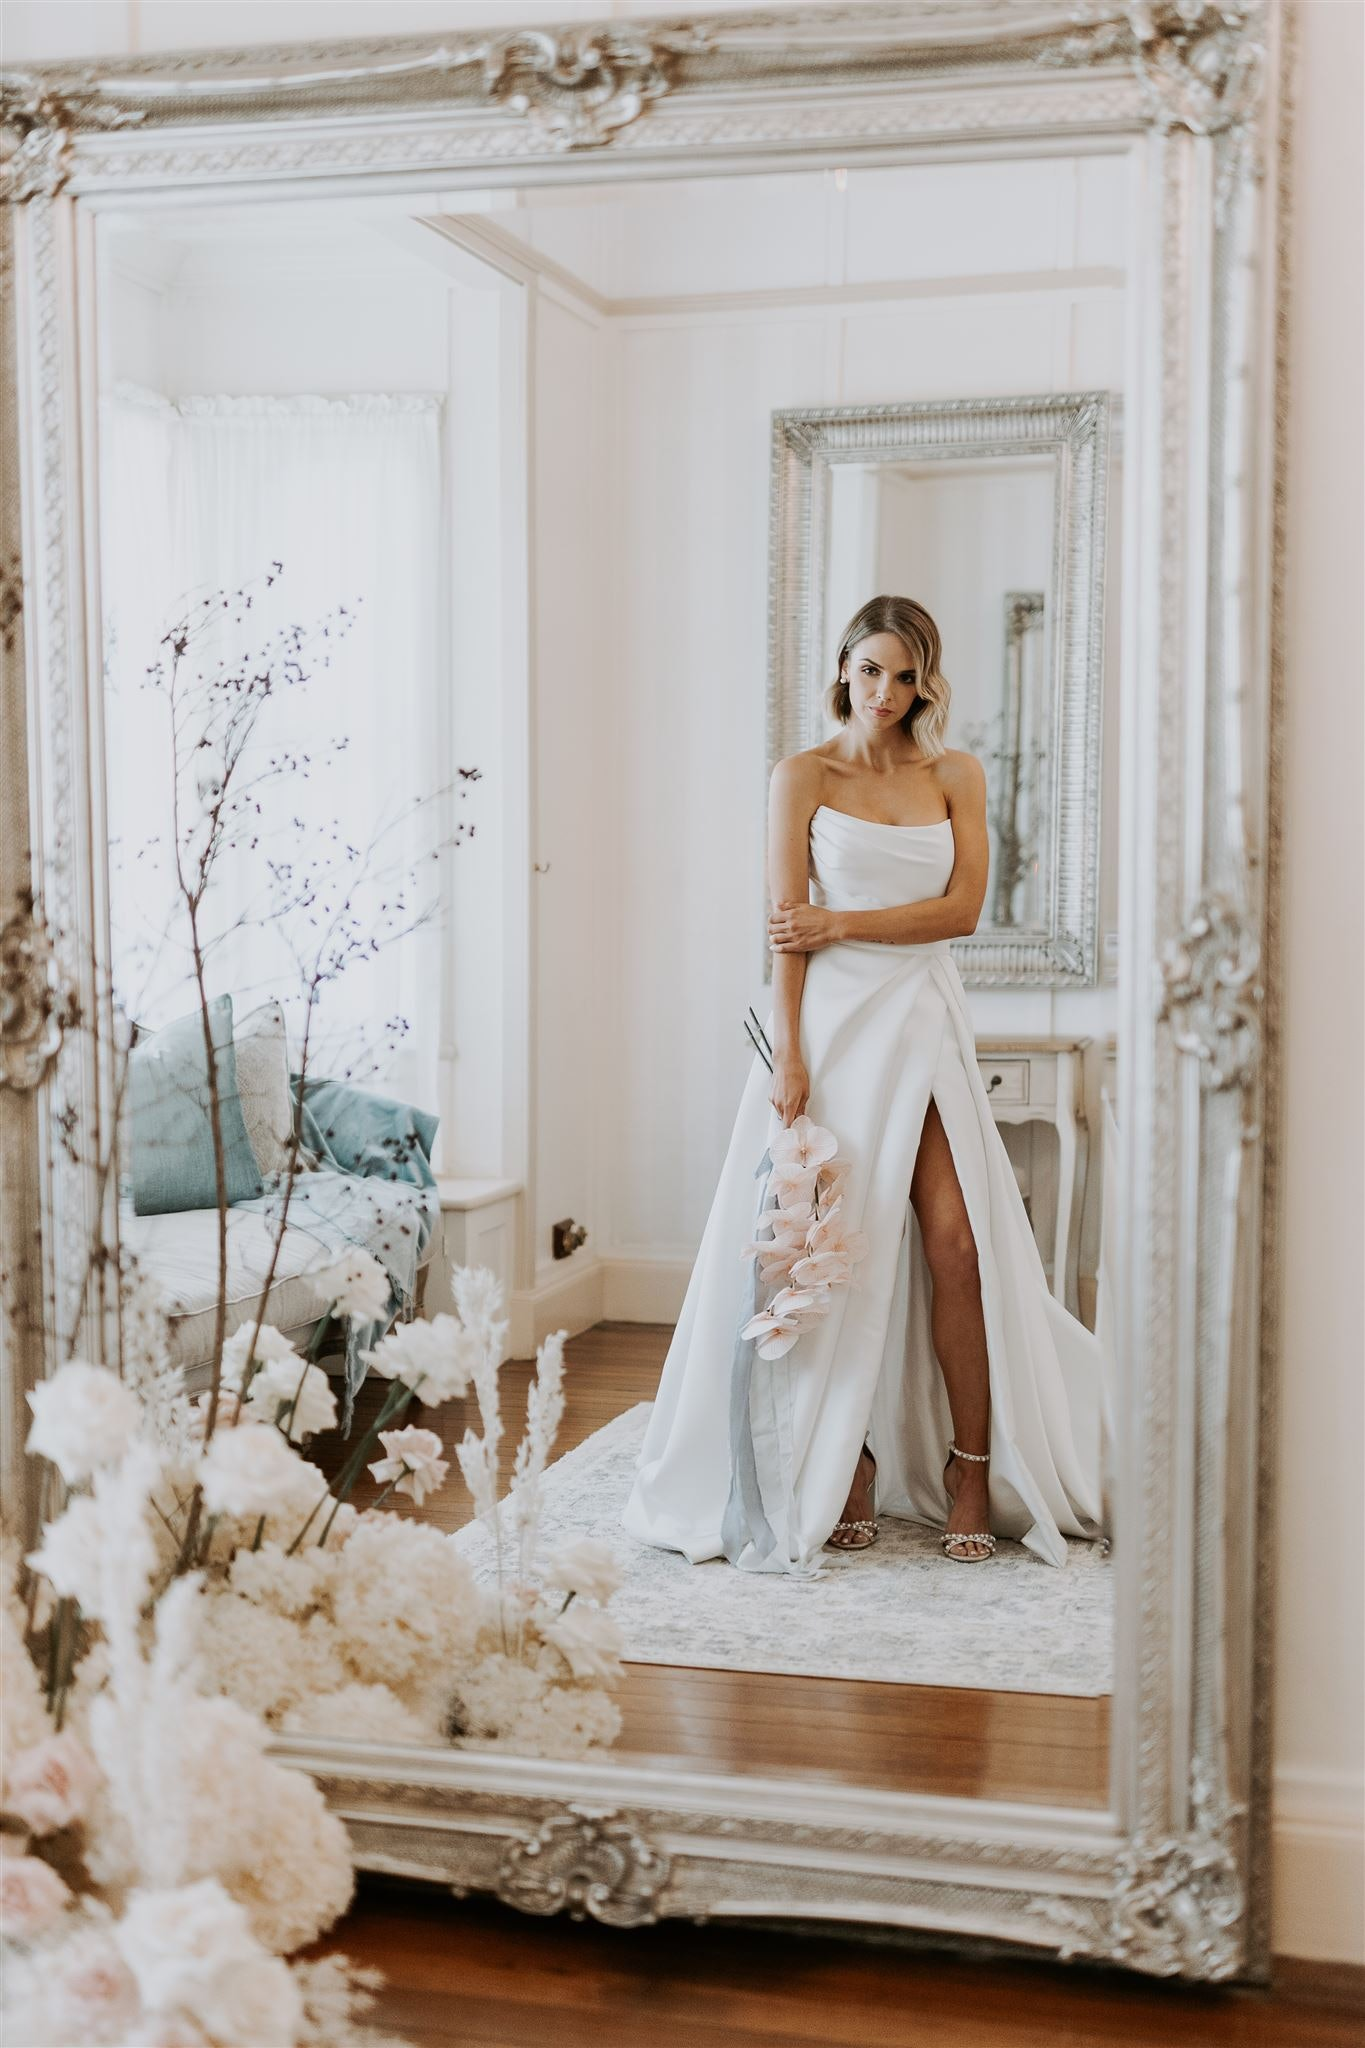 bride looks in mirror in bride's retreat